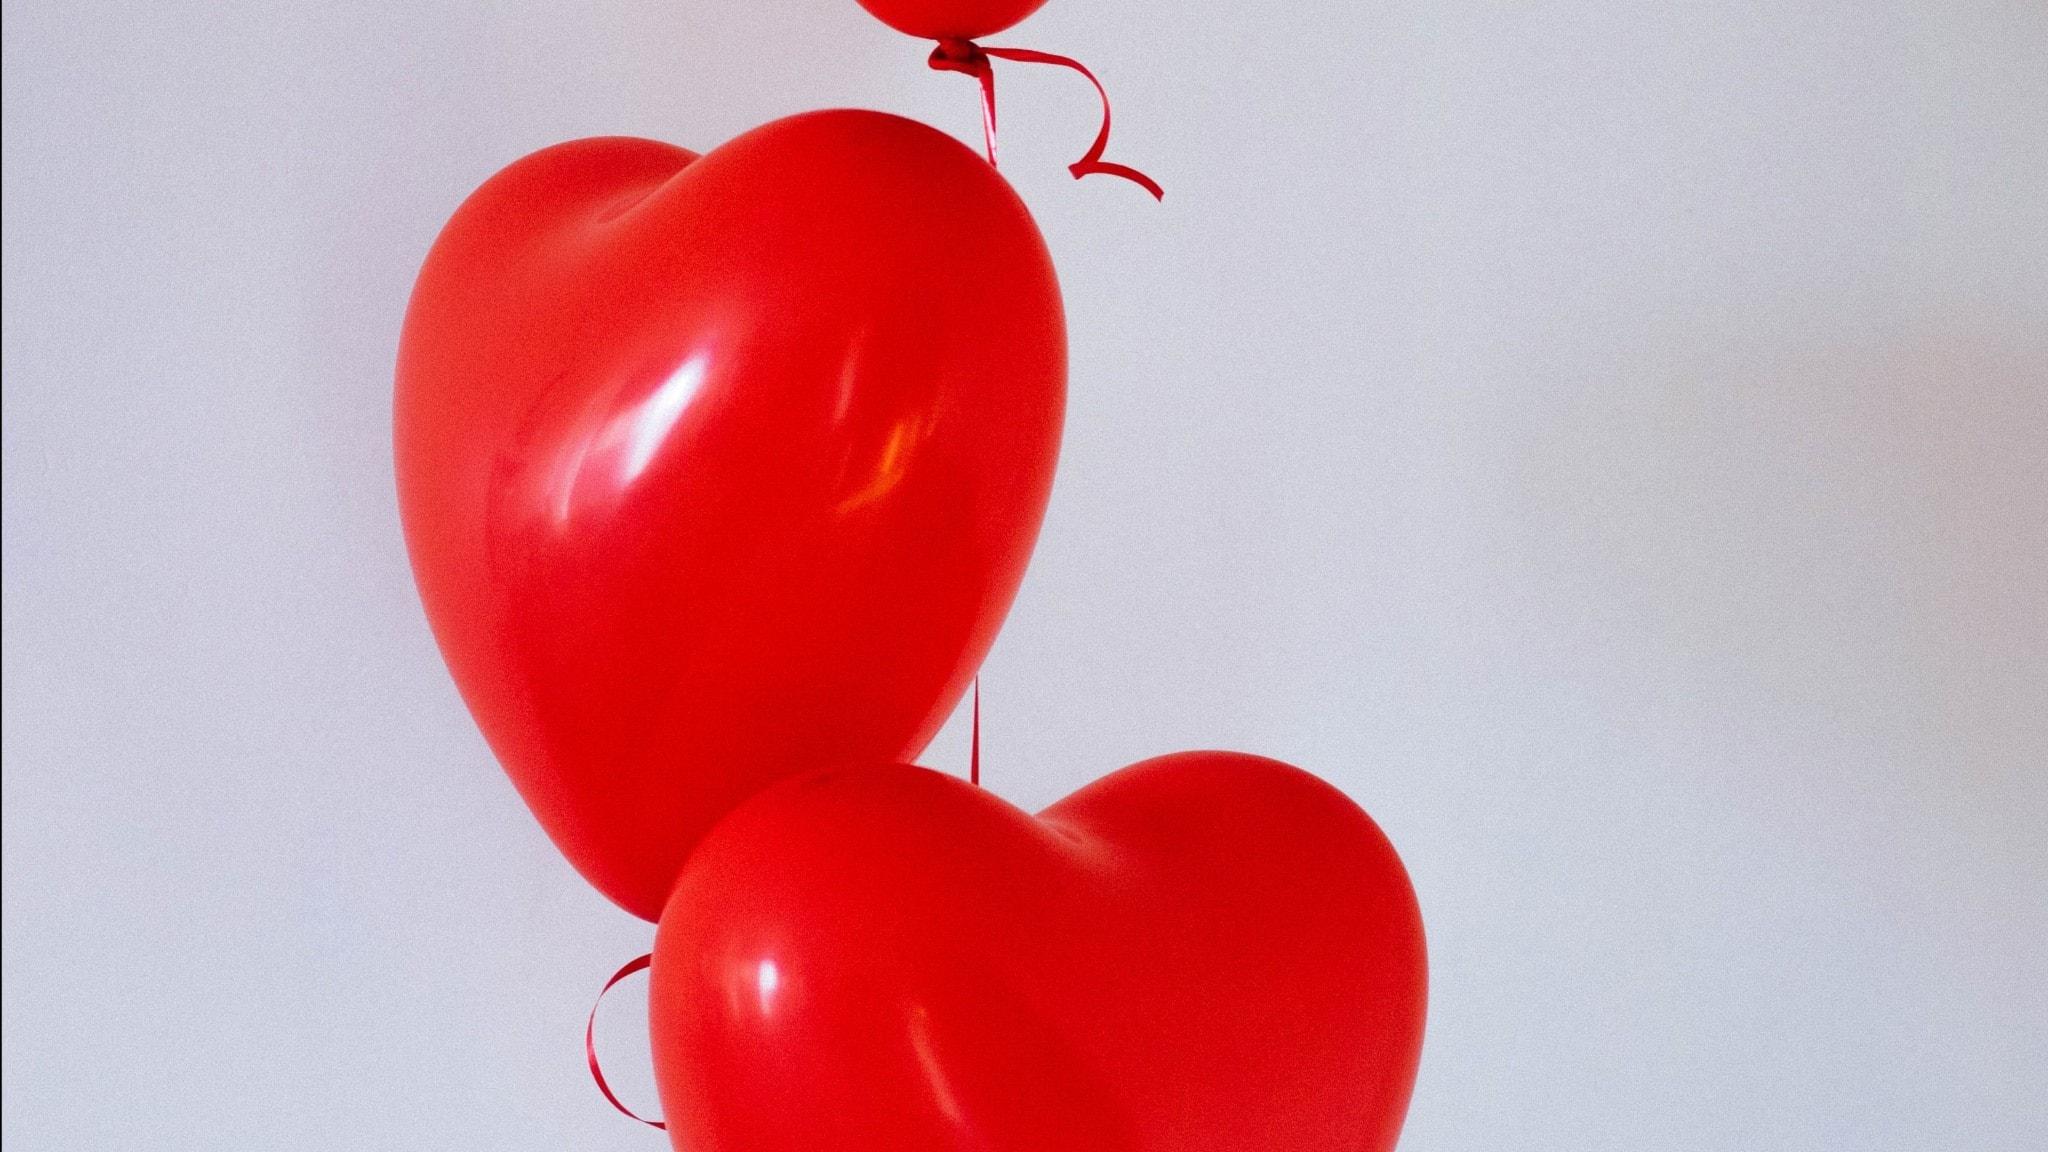 hjärtballonger